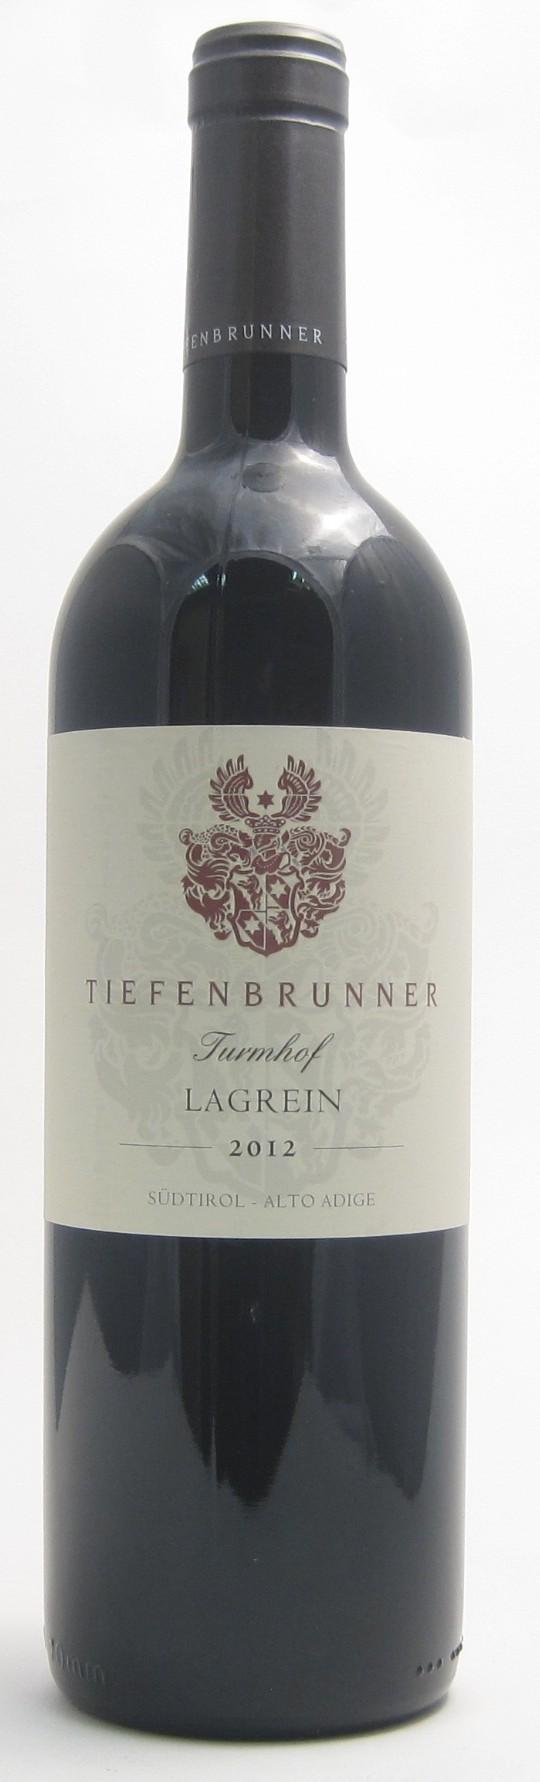 Tiefenbrunner 'Turmhof' Lagrein